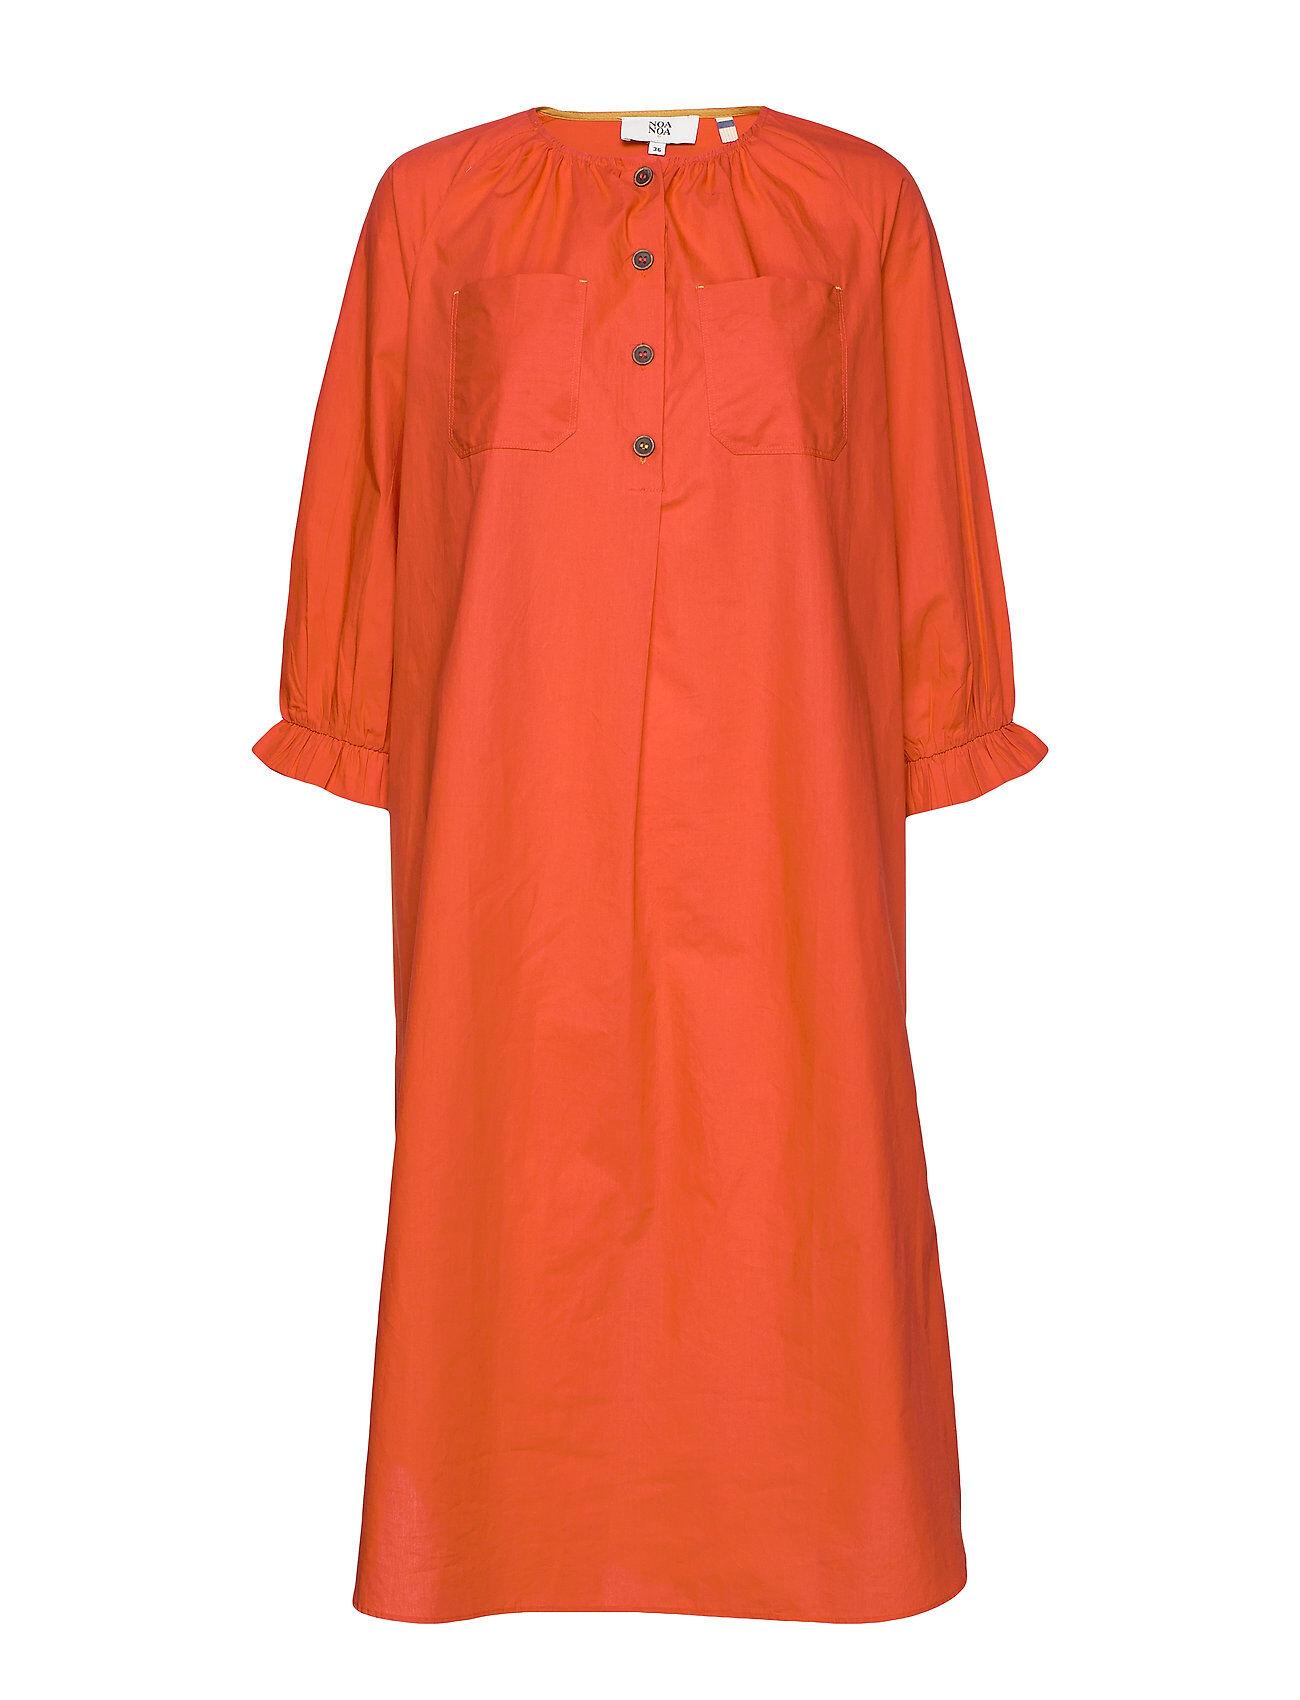 Noa Noa Dress Long Sleeve Polvipituinen Mekko Oranssi Noa Noa